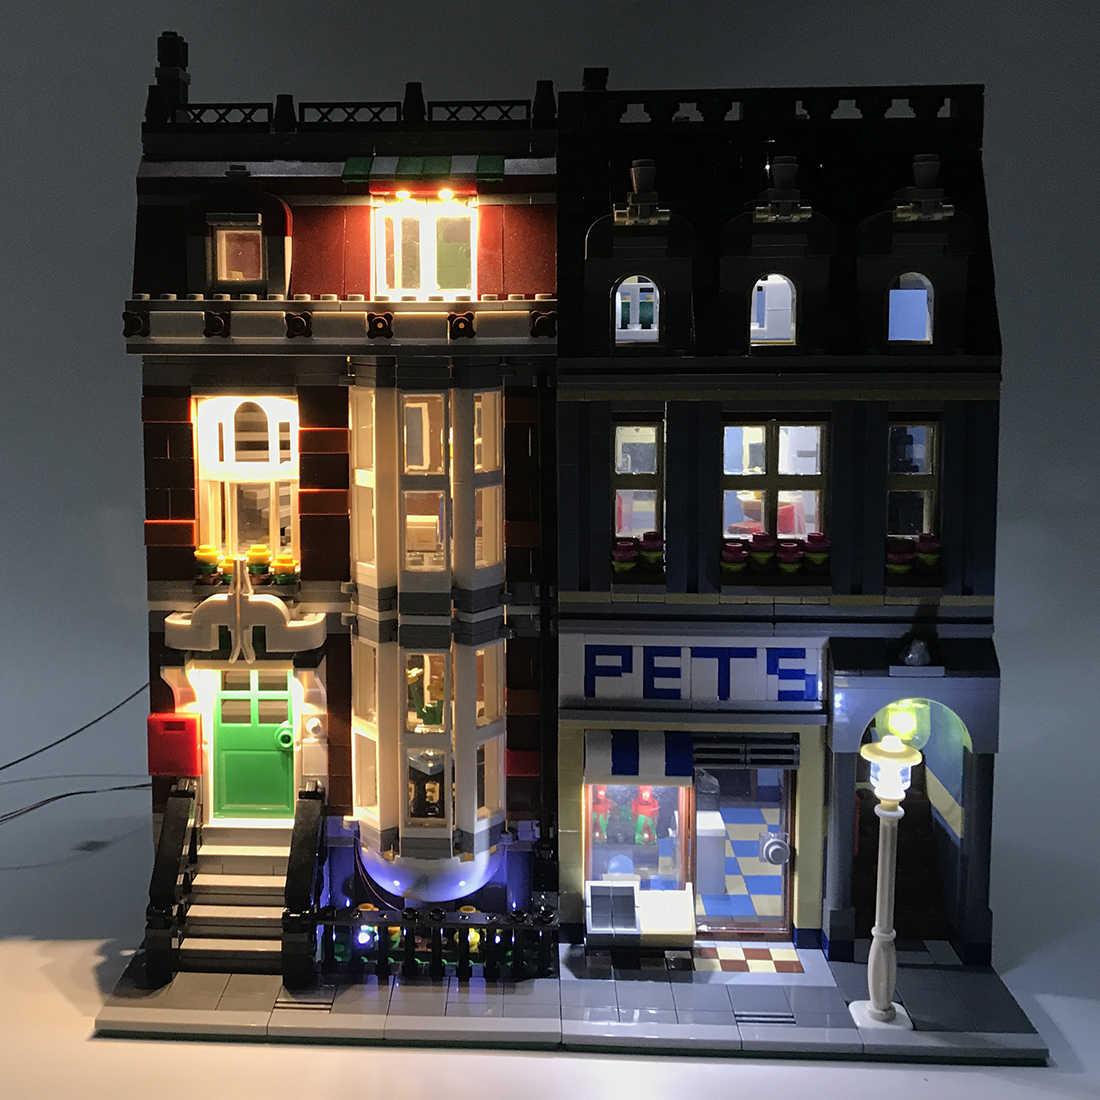 LED Light Up Kit For LEGO Pet Shop Supermarket 10218 Set building Bricks kit set